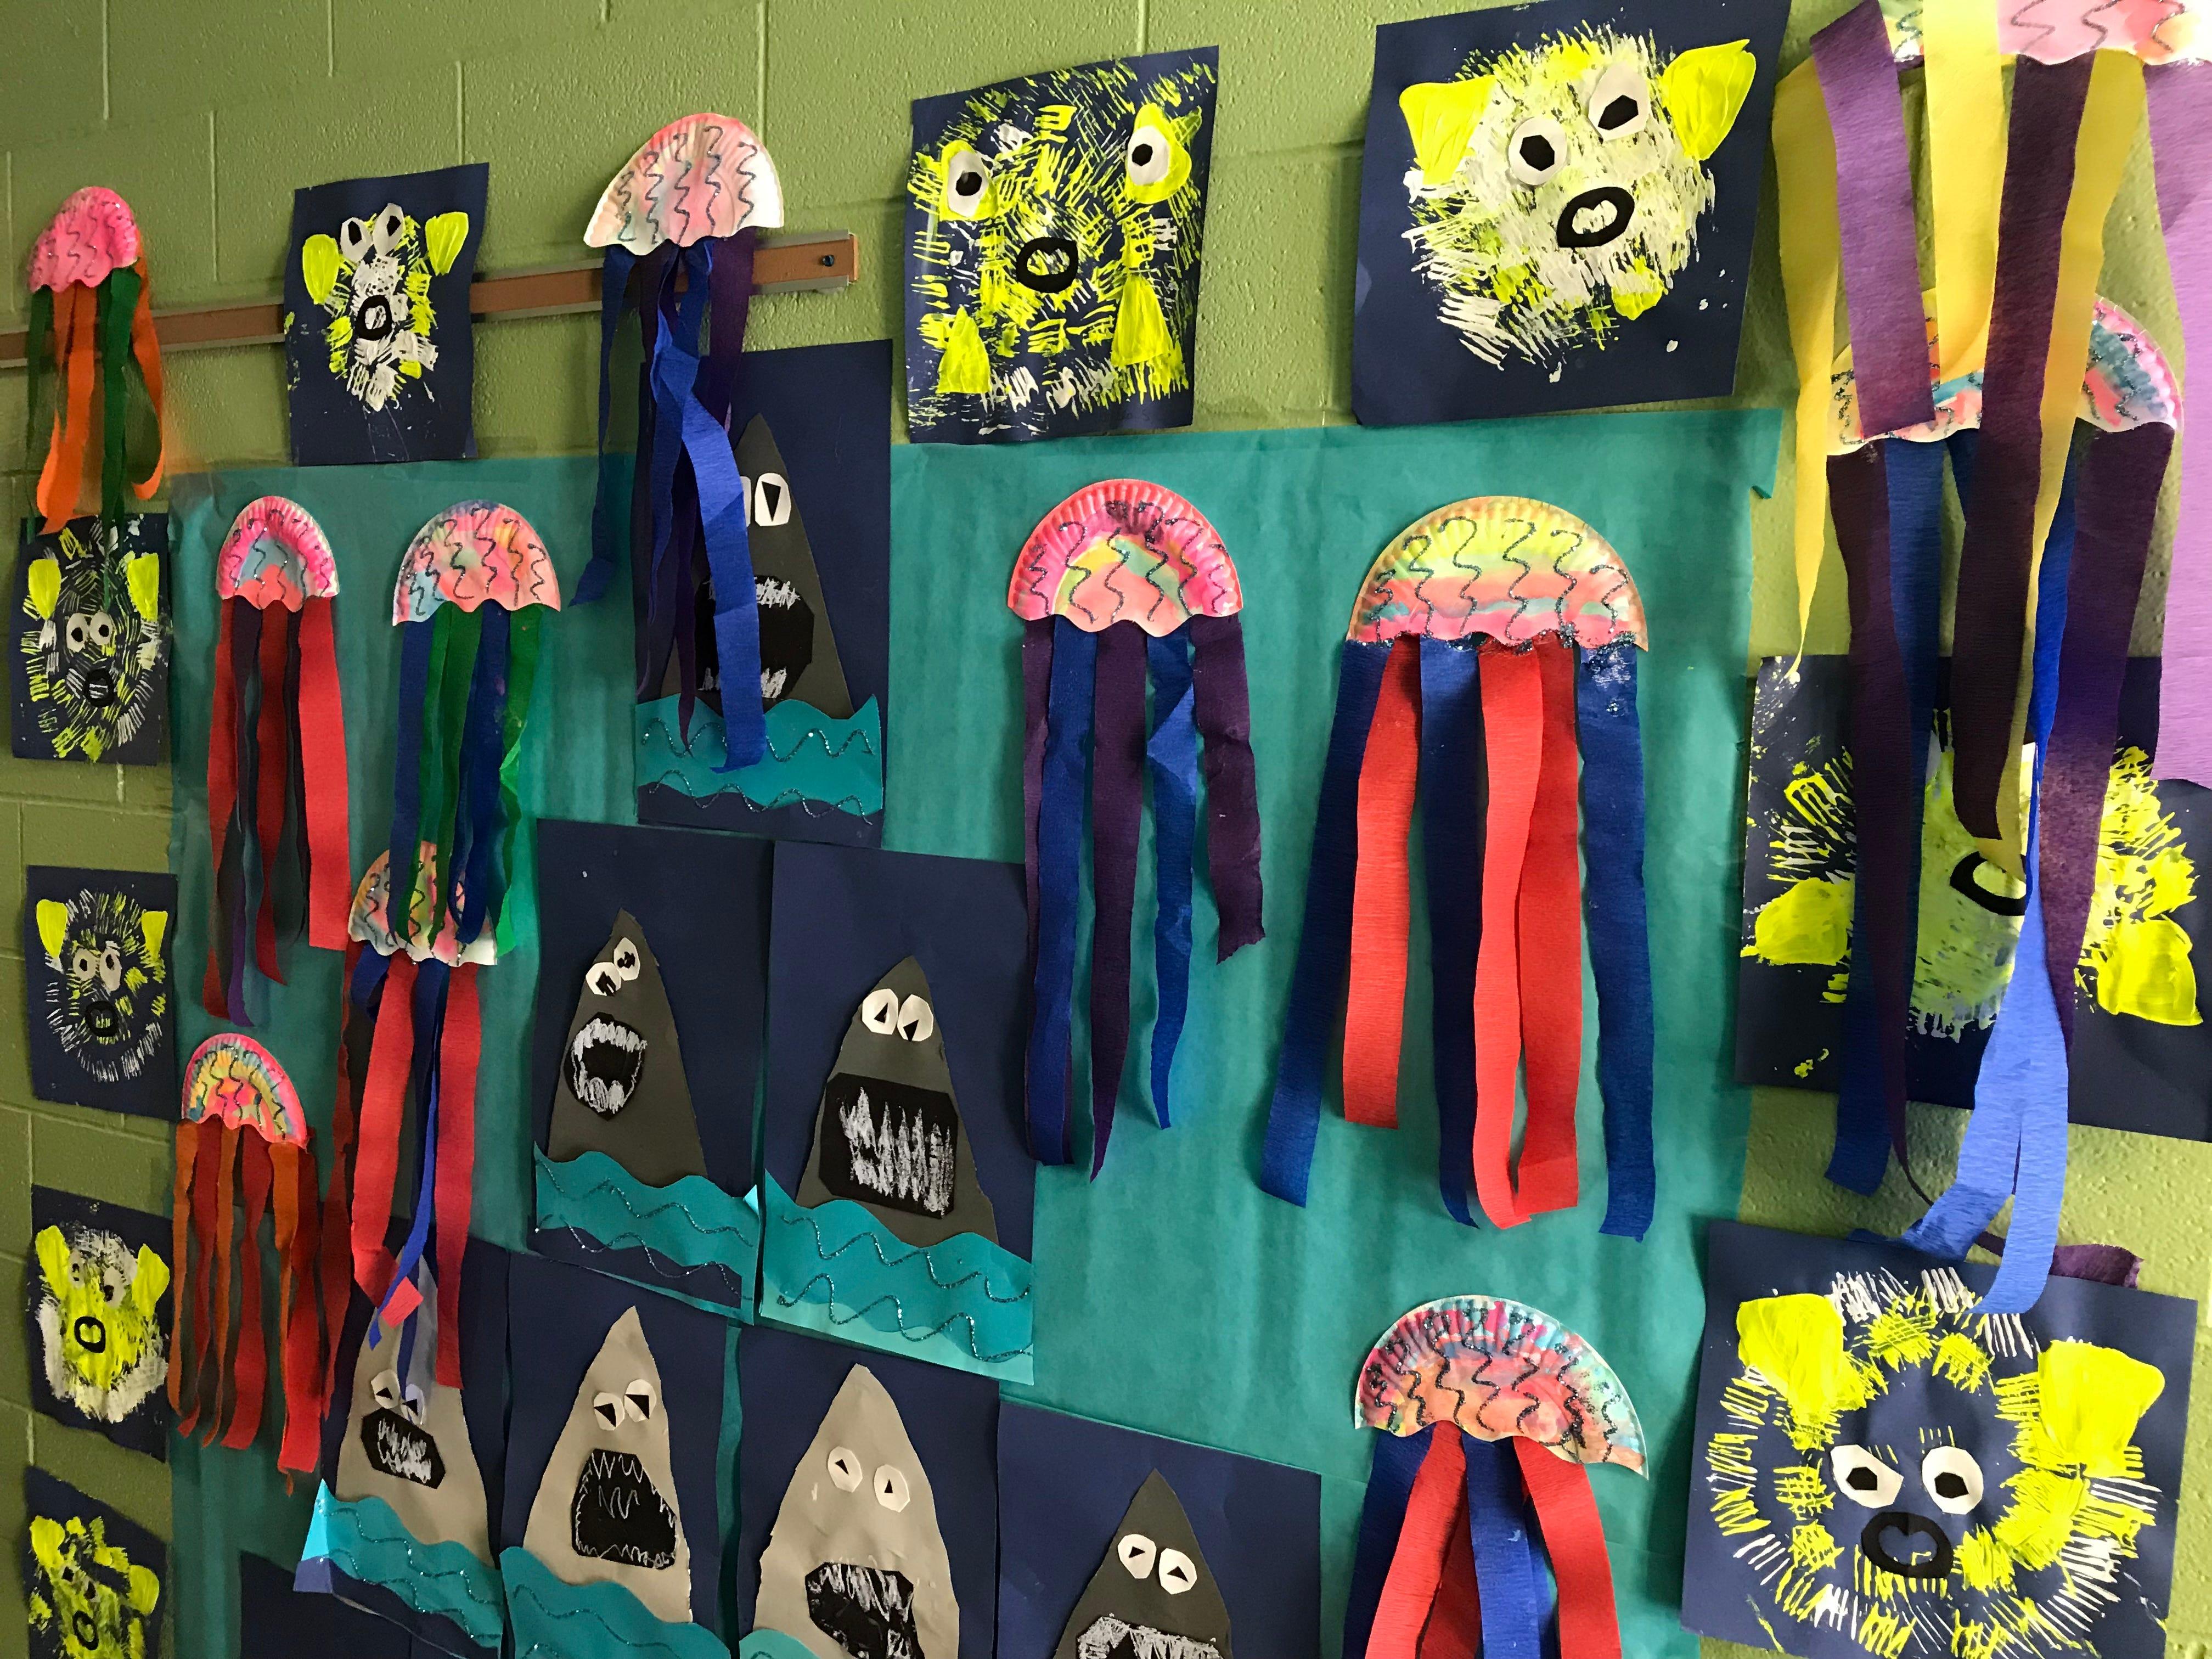 Kindergarten hallway at Riddle Elementary School in Lansing.